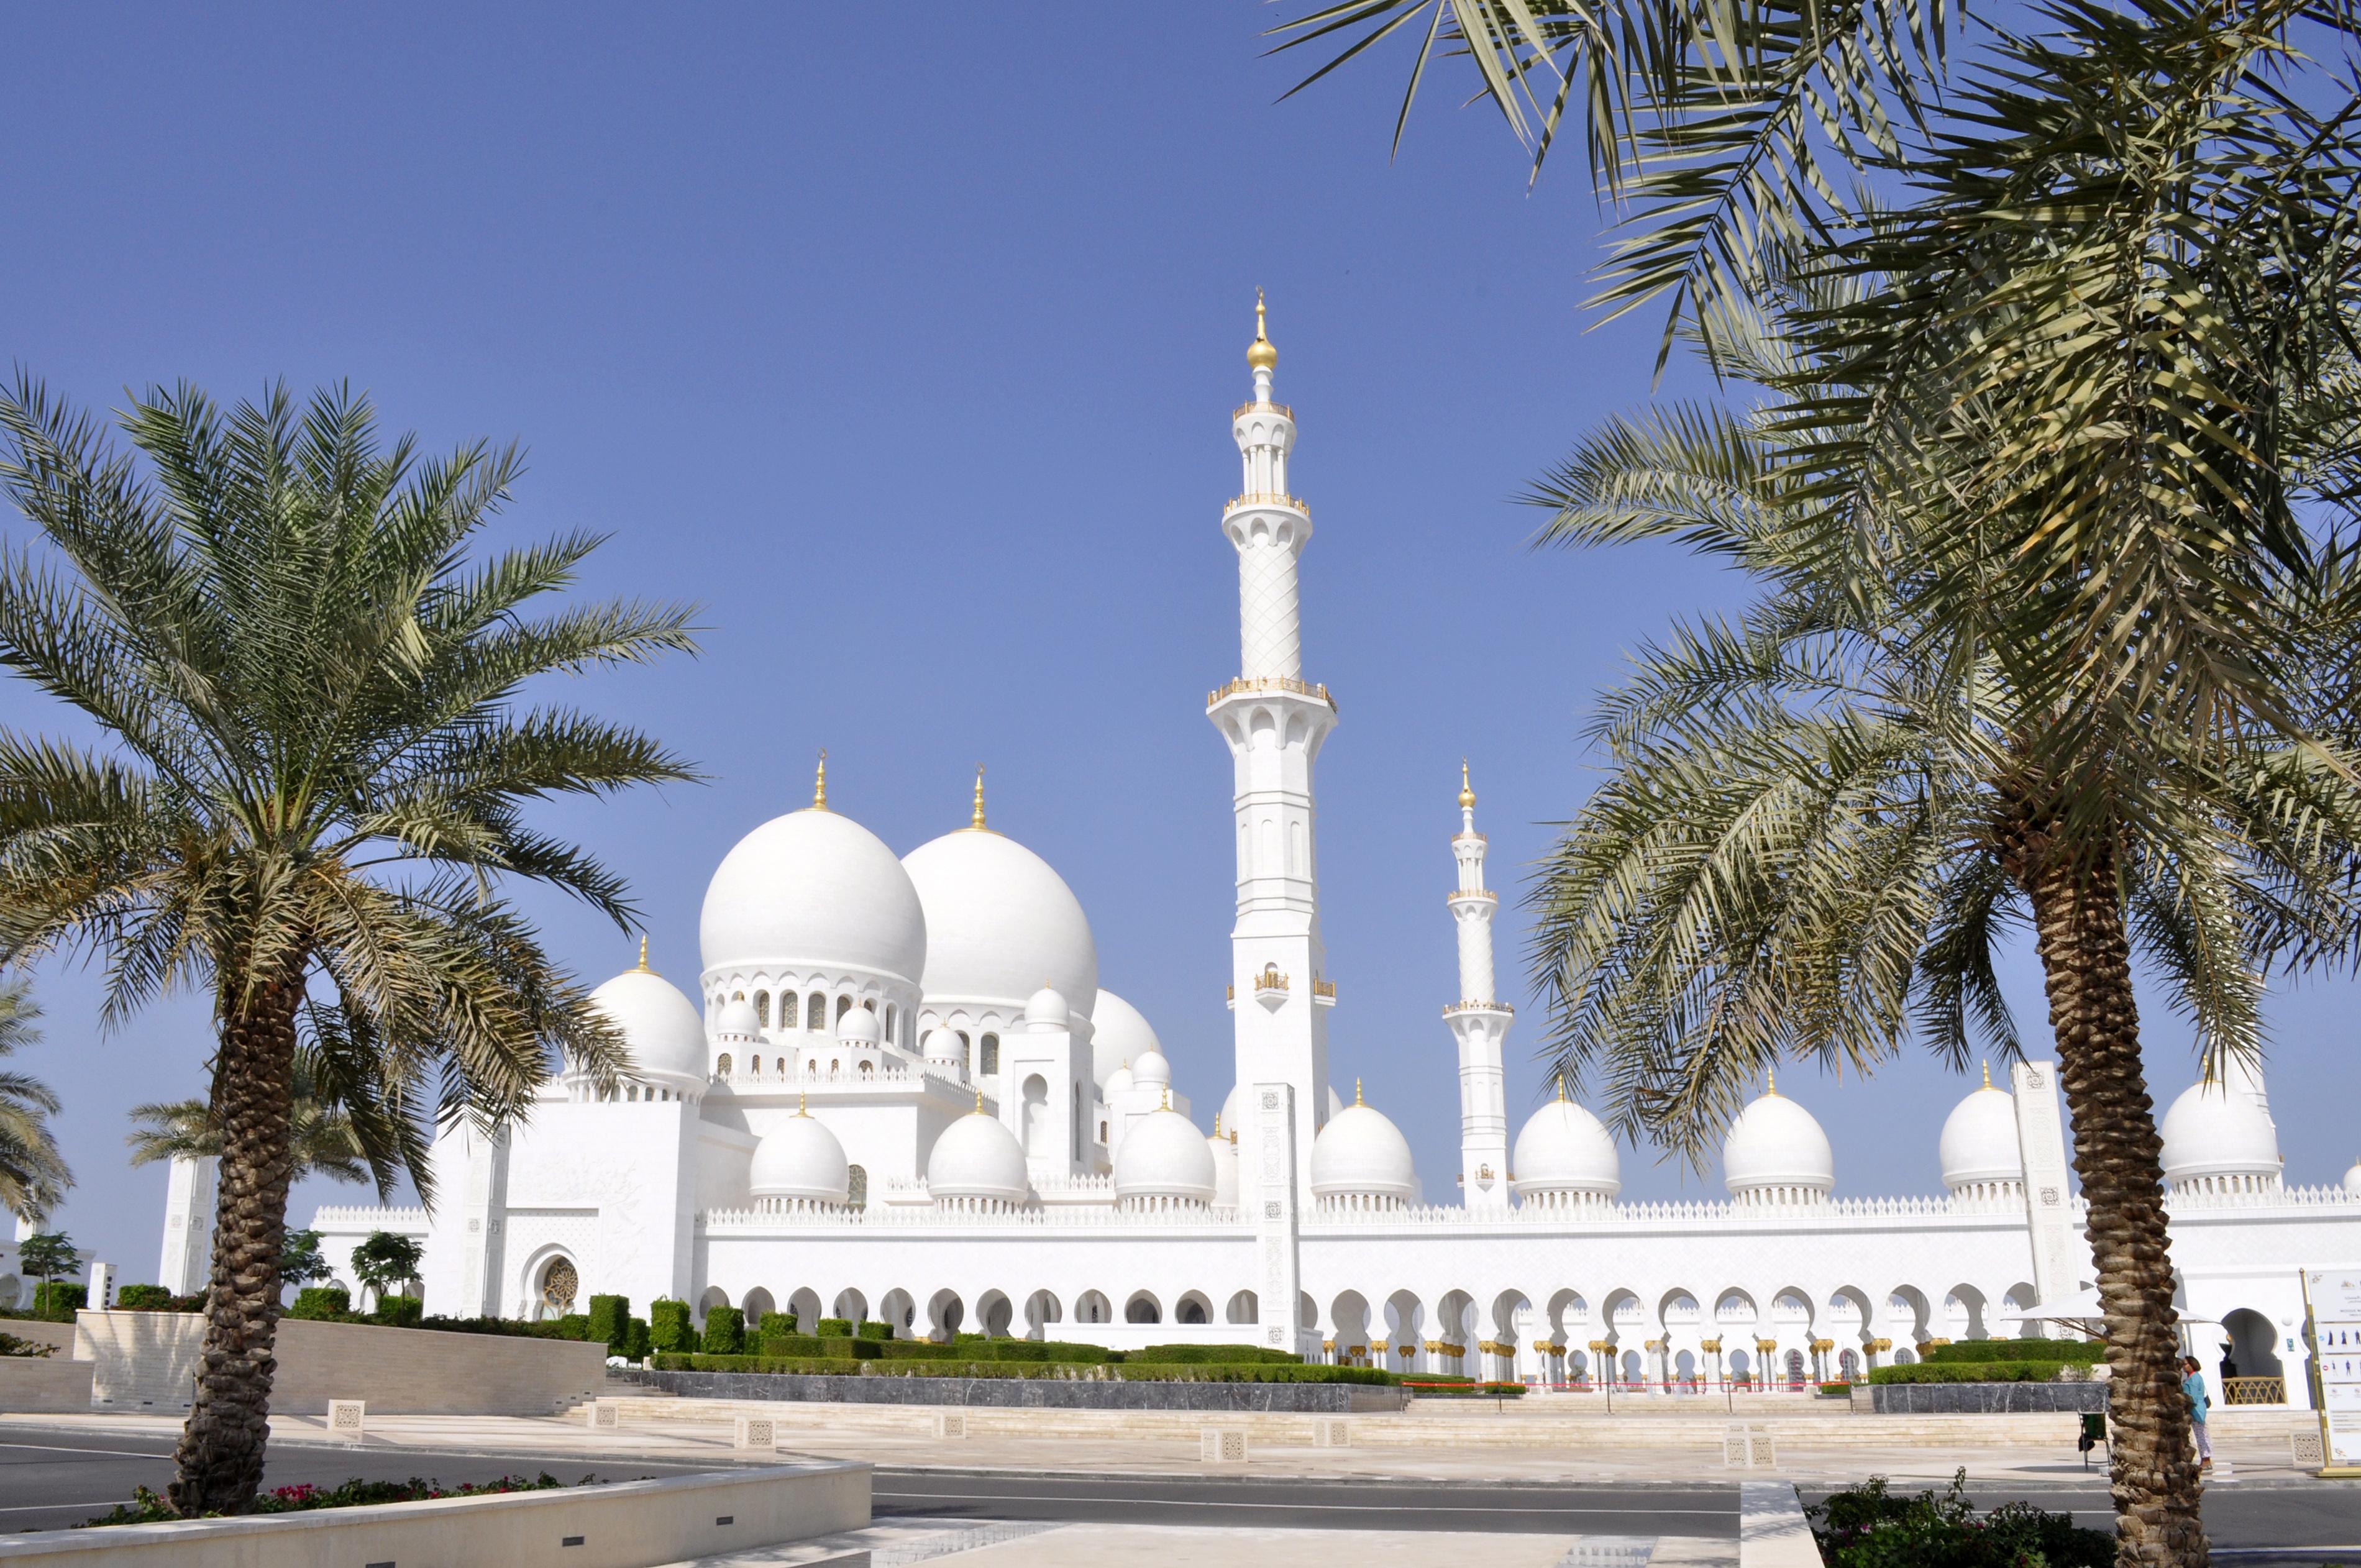 Abu-Dhabi-la-grande-moschea-di-Sheikh-Zayed